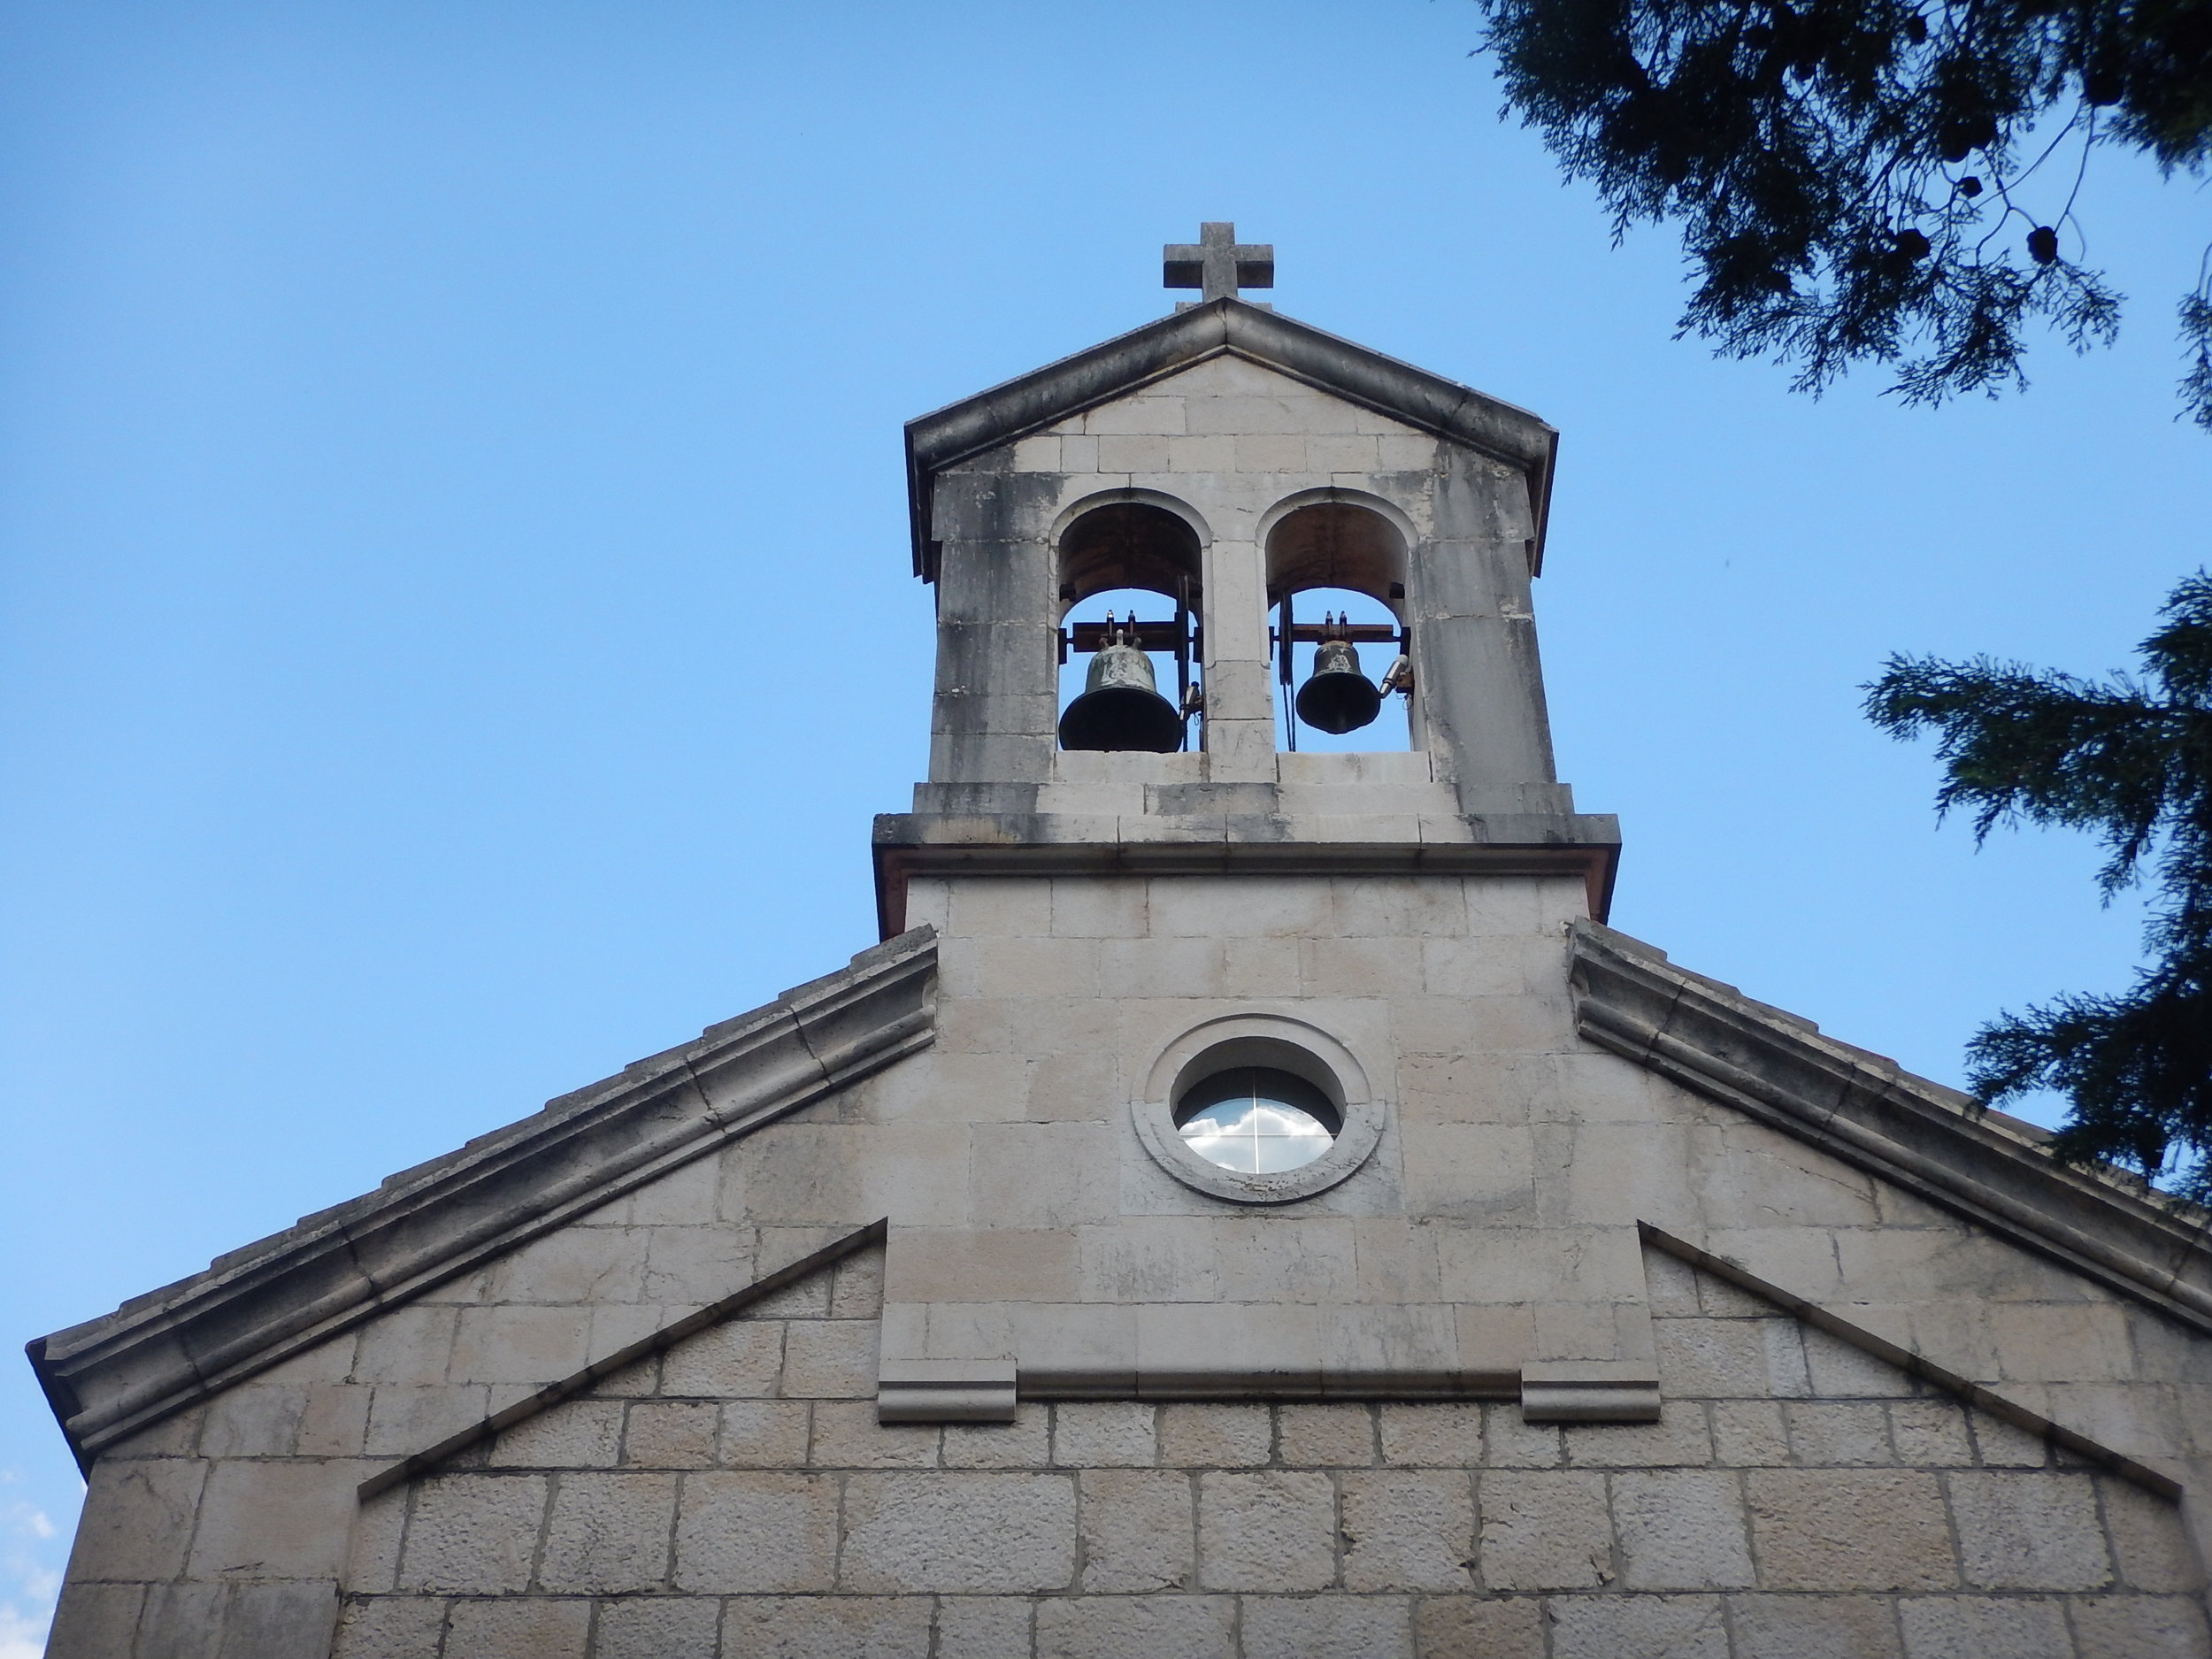 Interesting little bell tower.